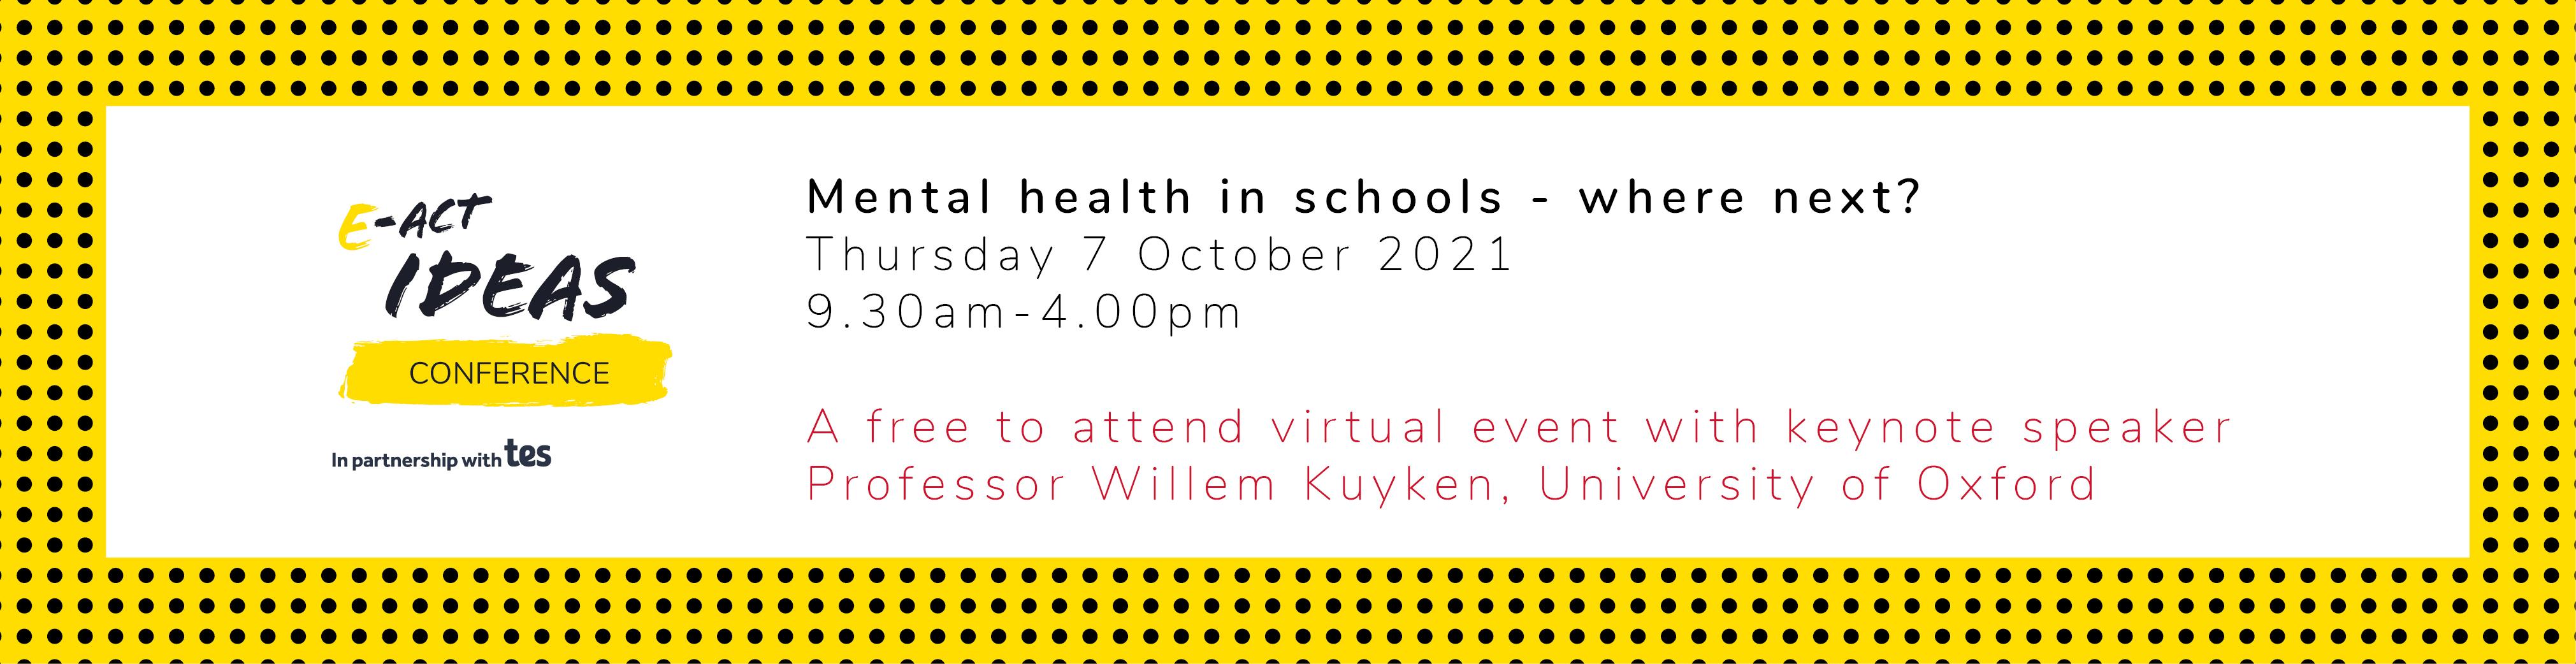 E-ACT Ideas Conference - 7 October 2021